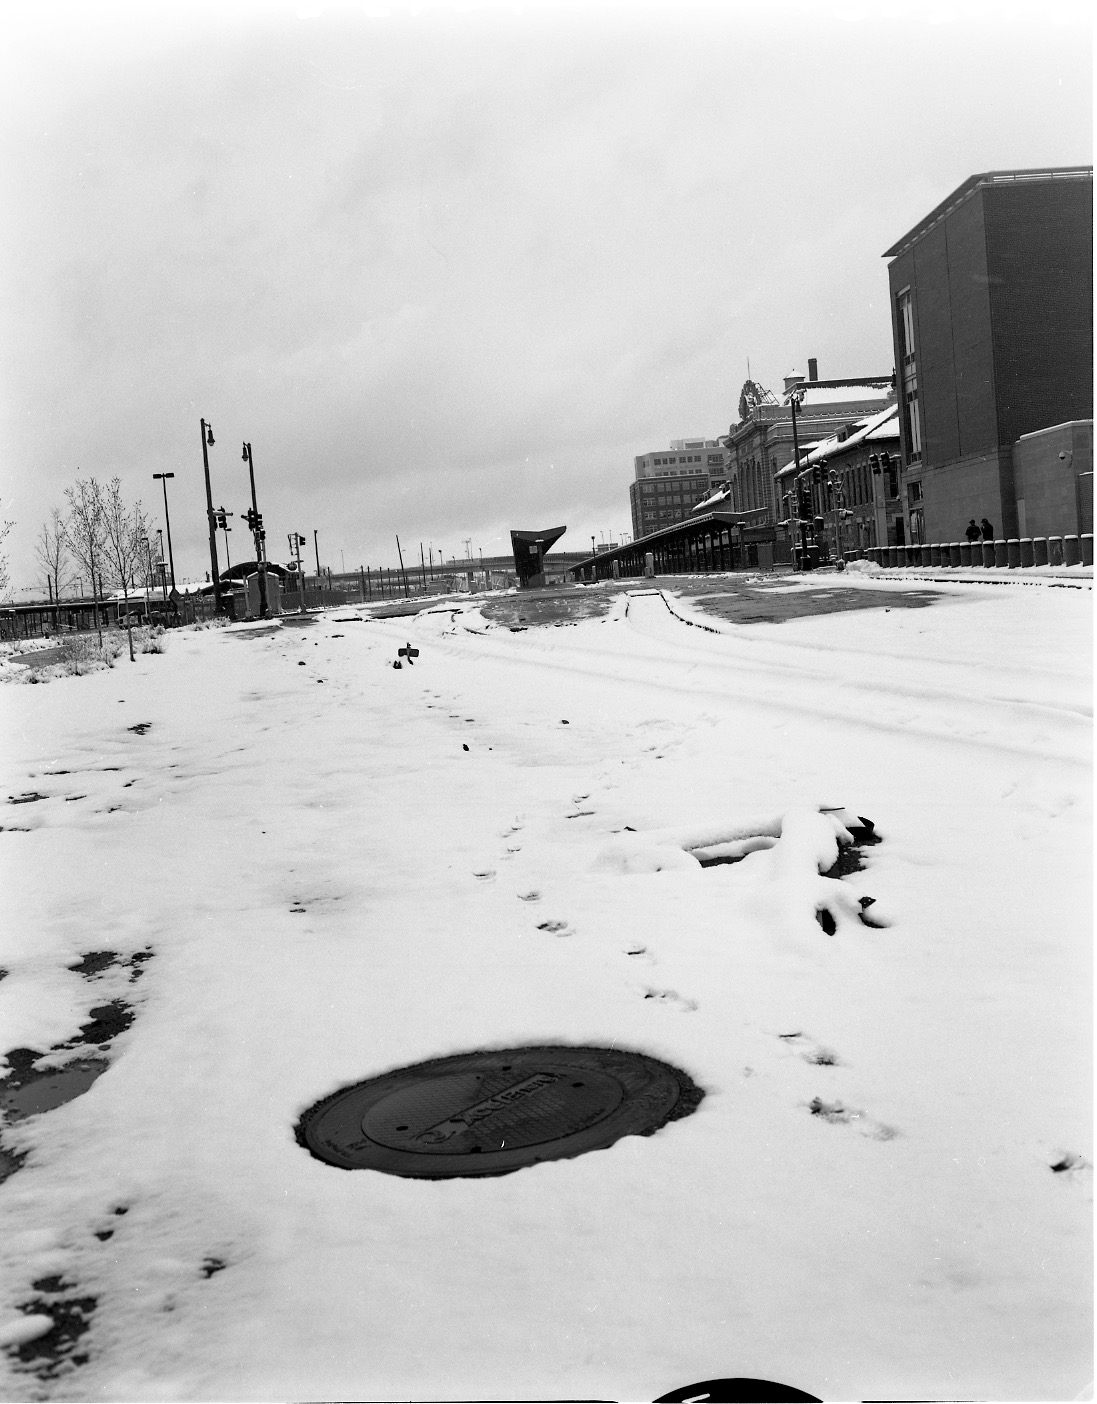 Tracks of Denver's Union Station